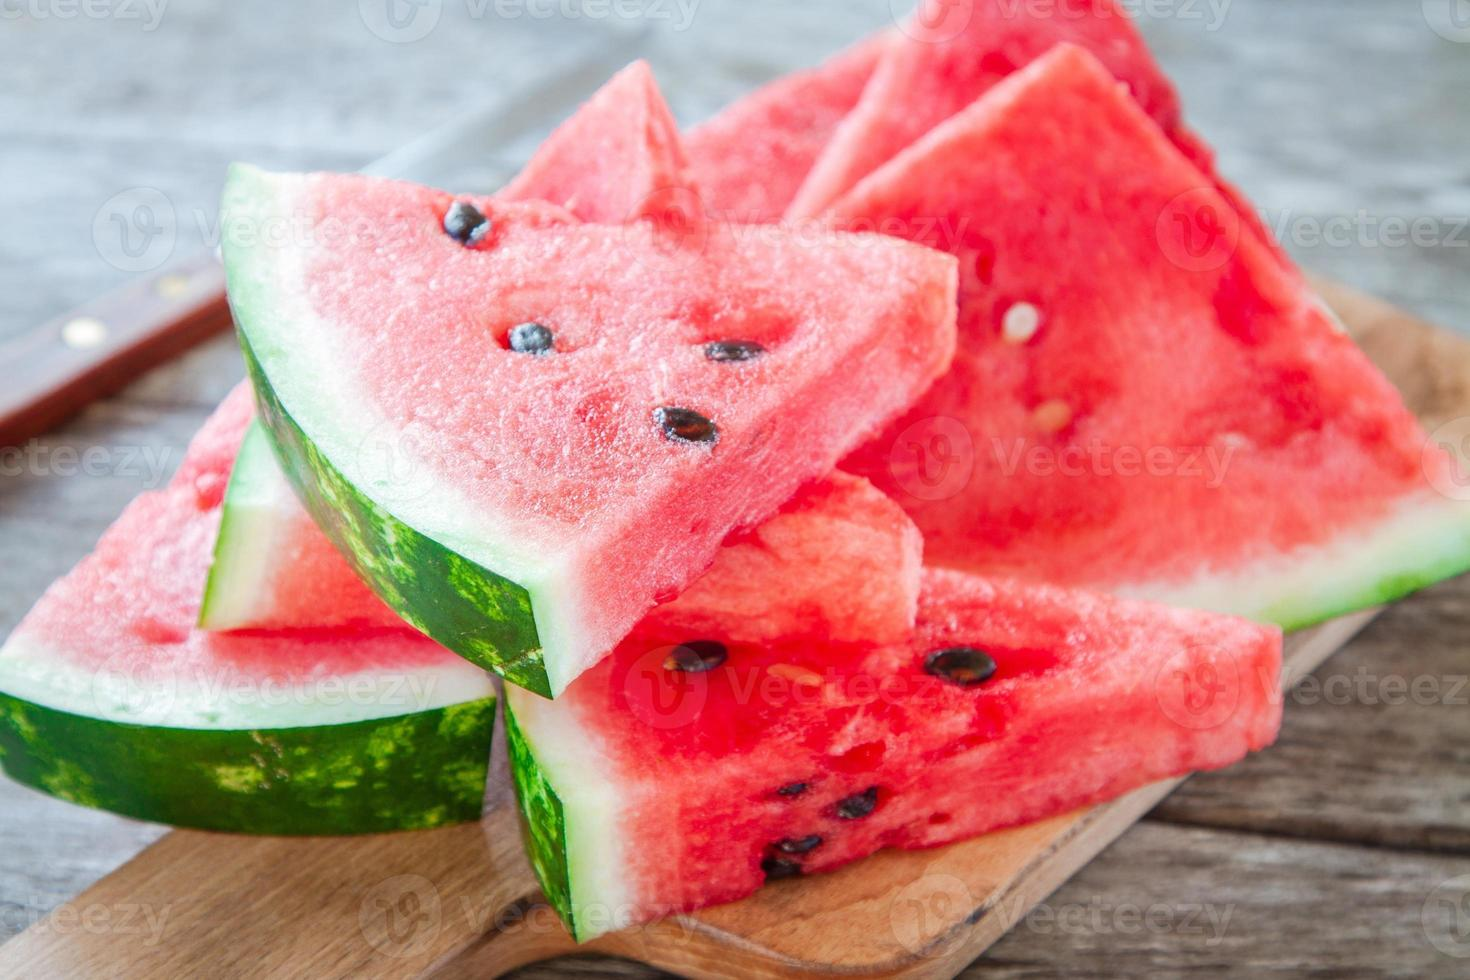 slices of fresh juicy organic watermelon photo